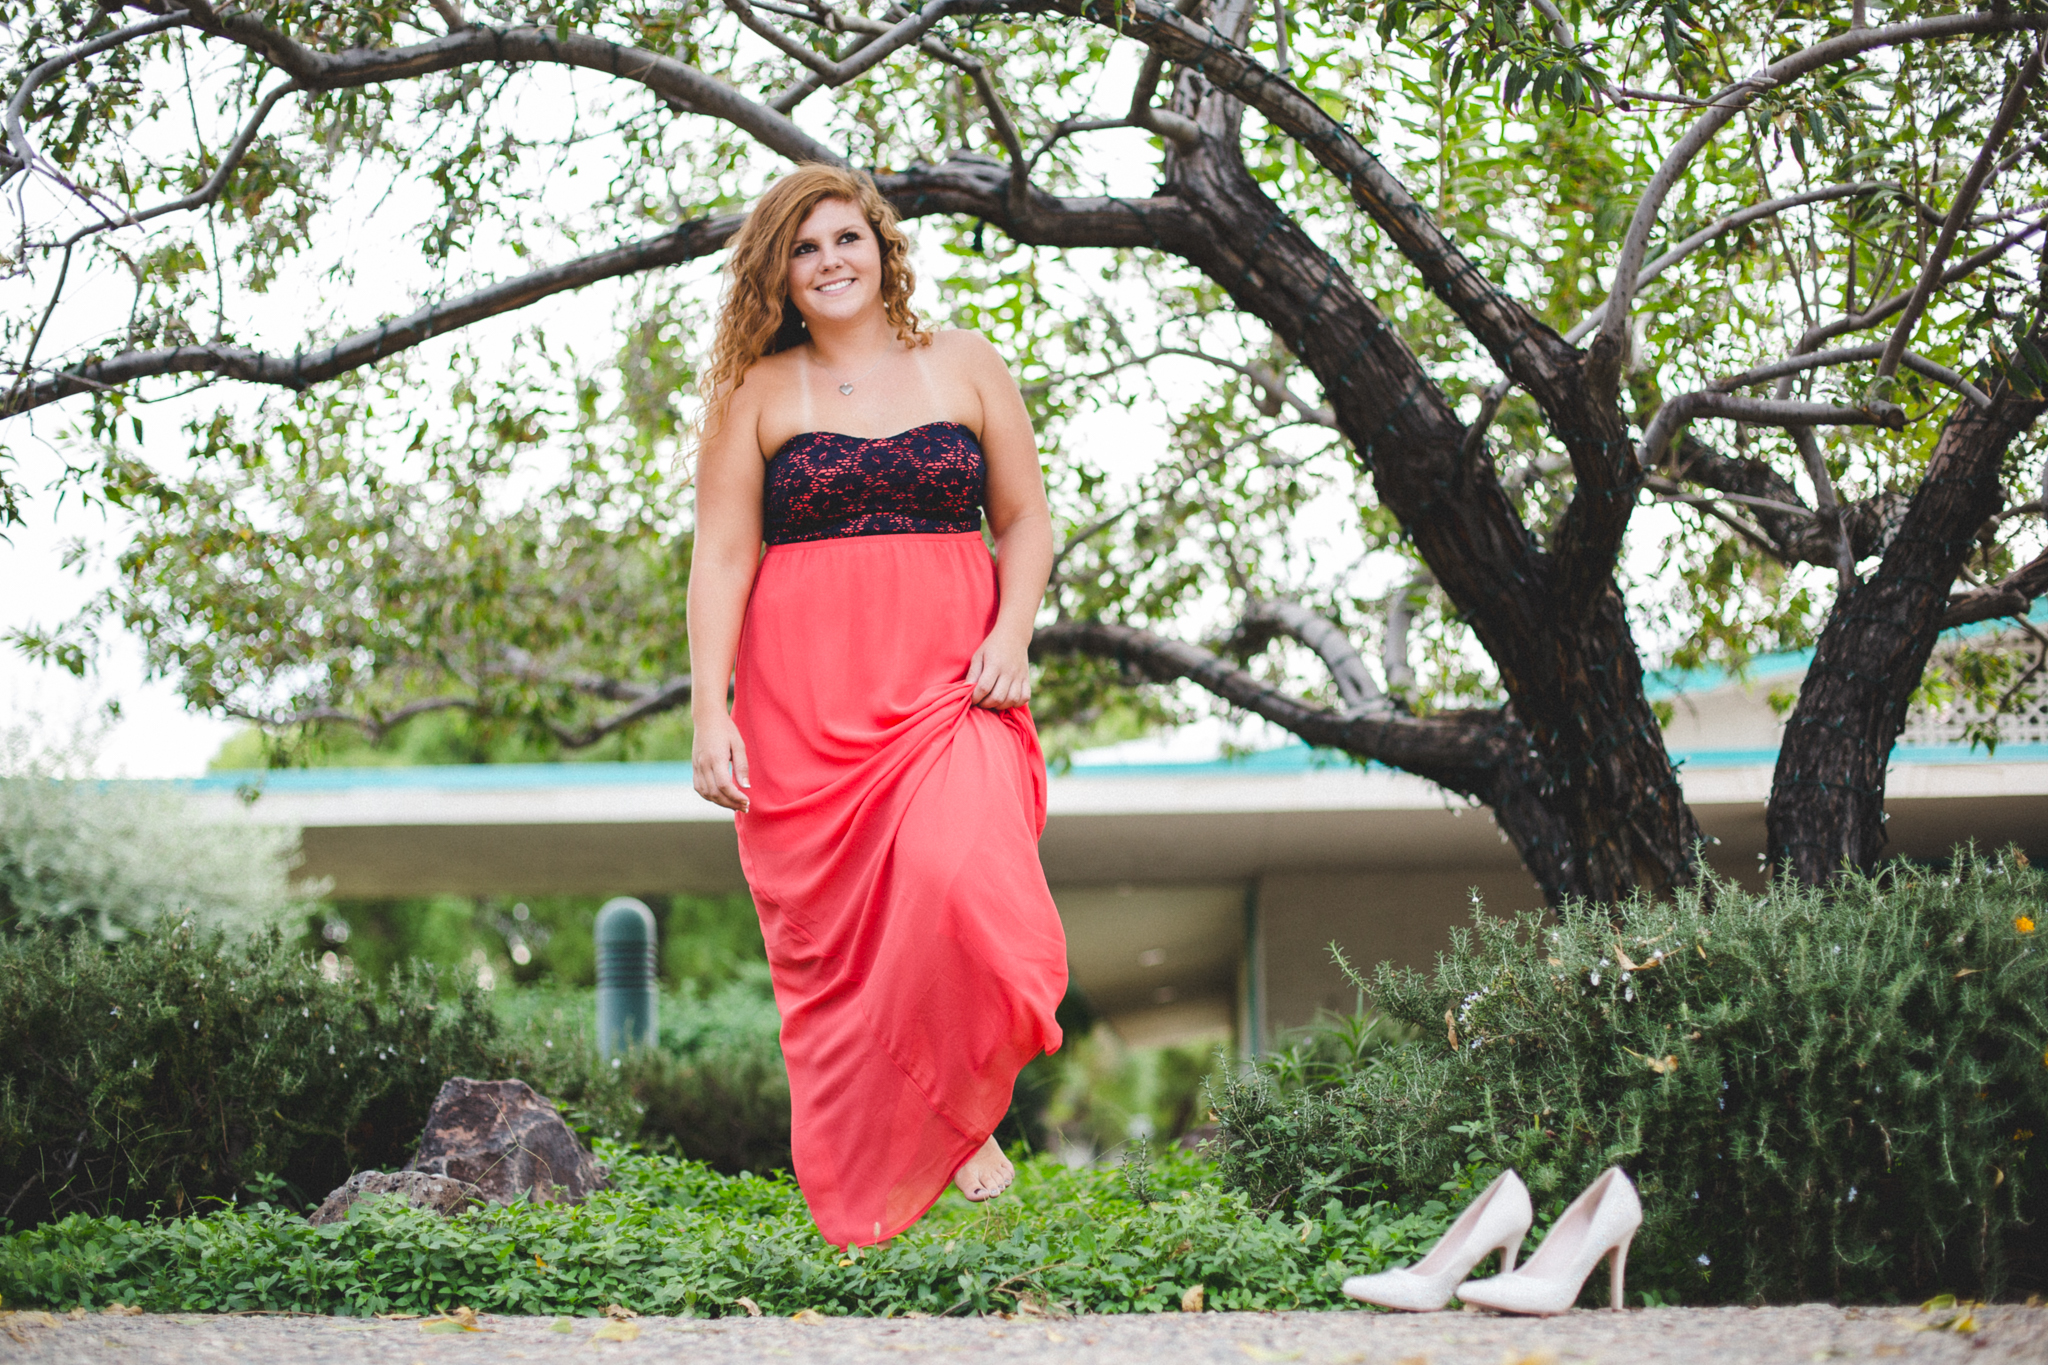 Marissa Walks Through Garden Senior Shoot